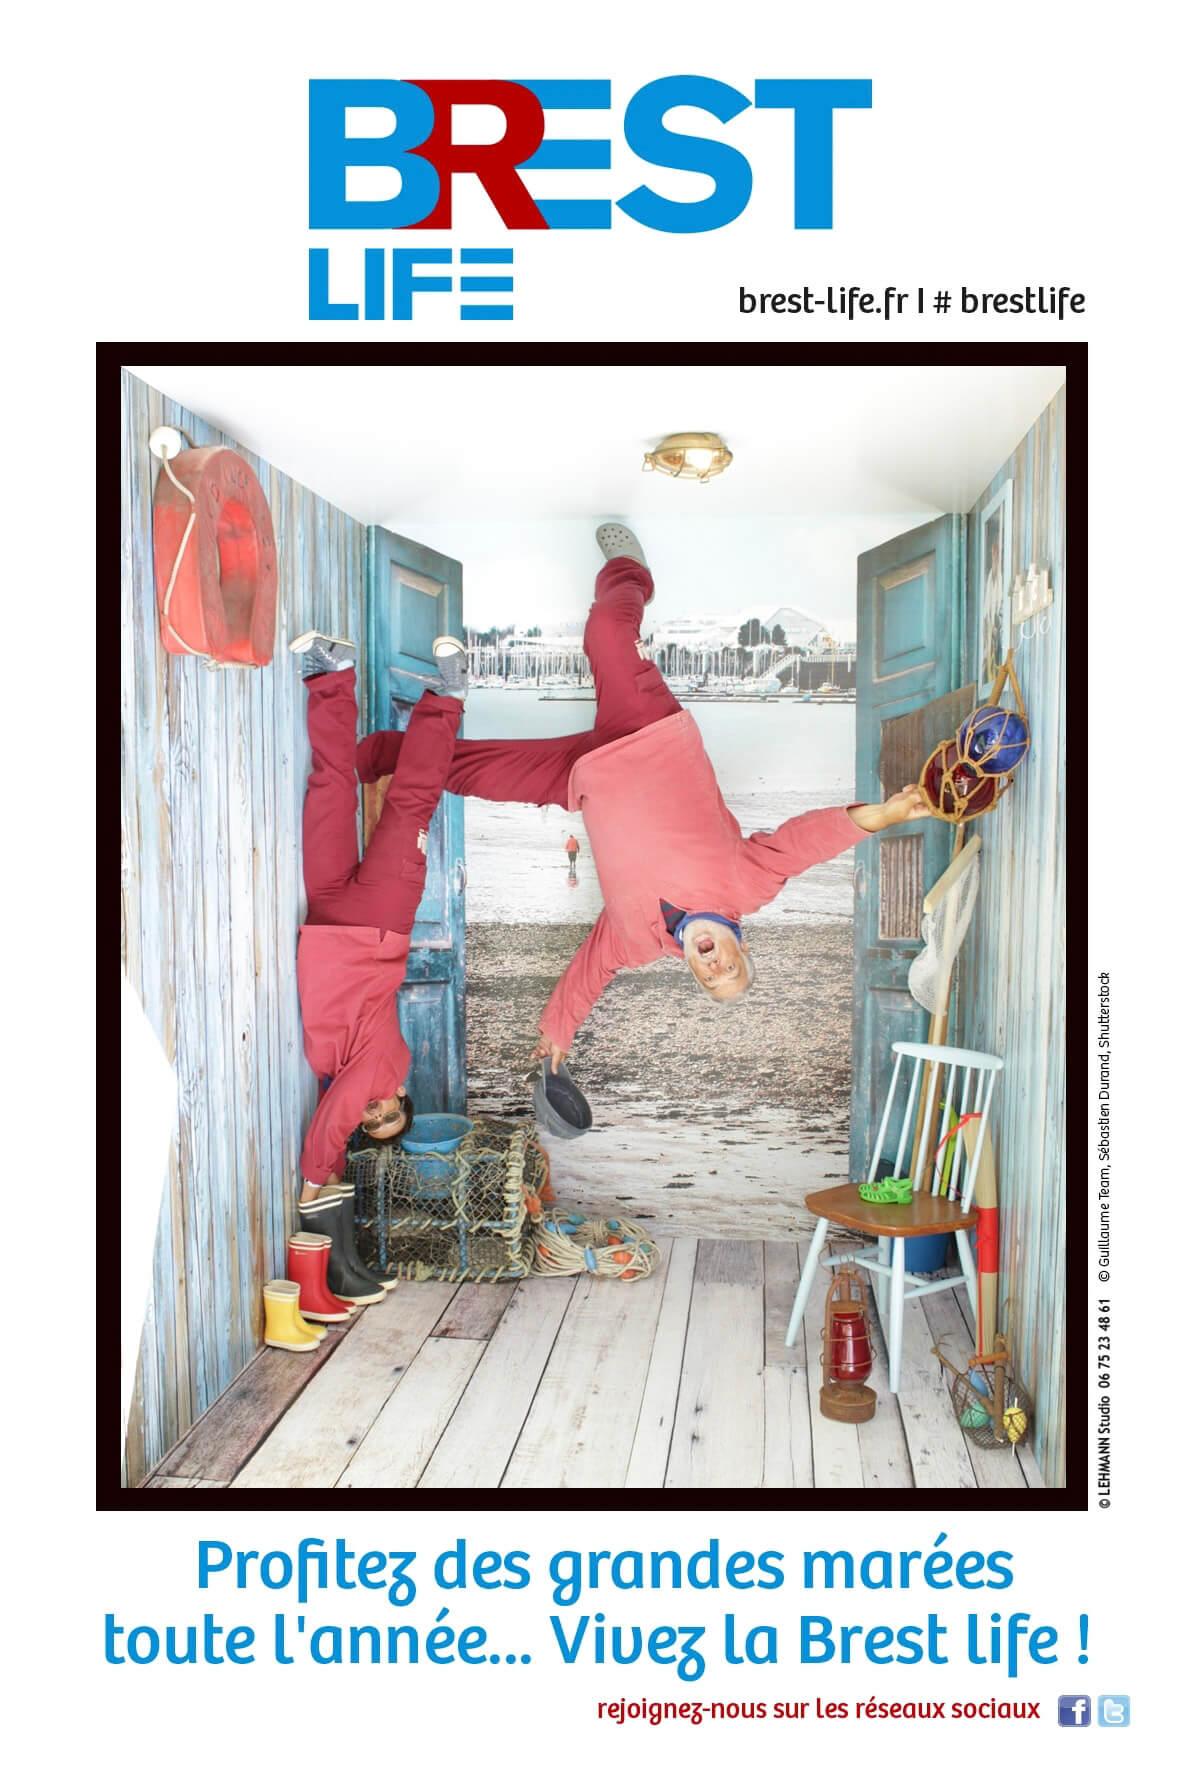 lehman-studio-photographe-angers-evenementiel-gravitybox-ambiance-cabane-de-plage-brest-life